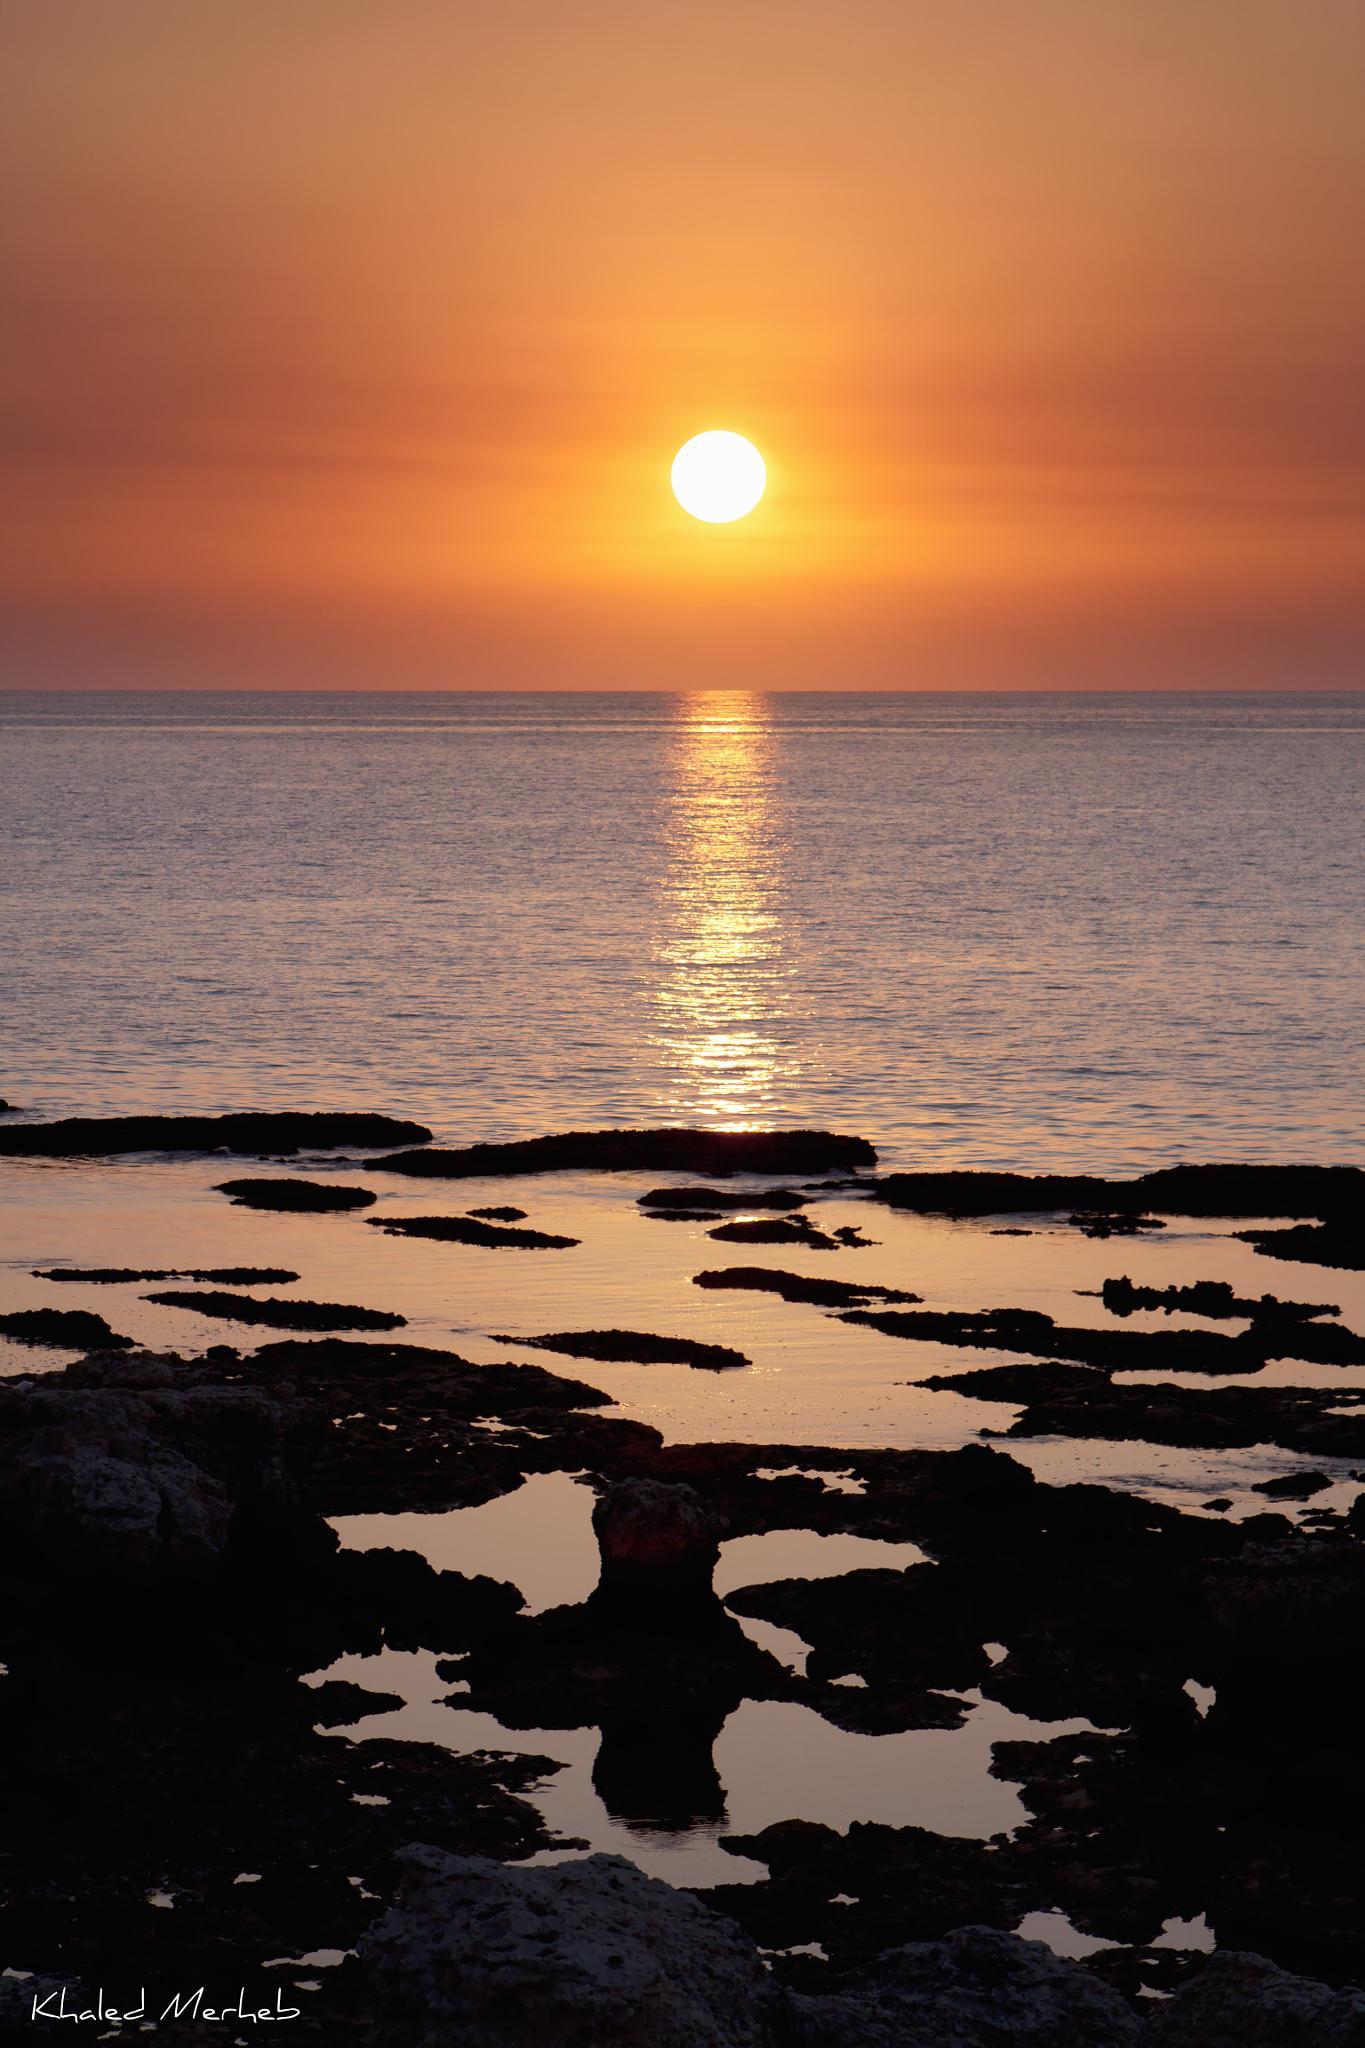 The Beauty Of A Sunset.. by khaledMerheb